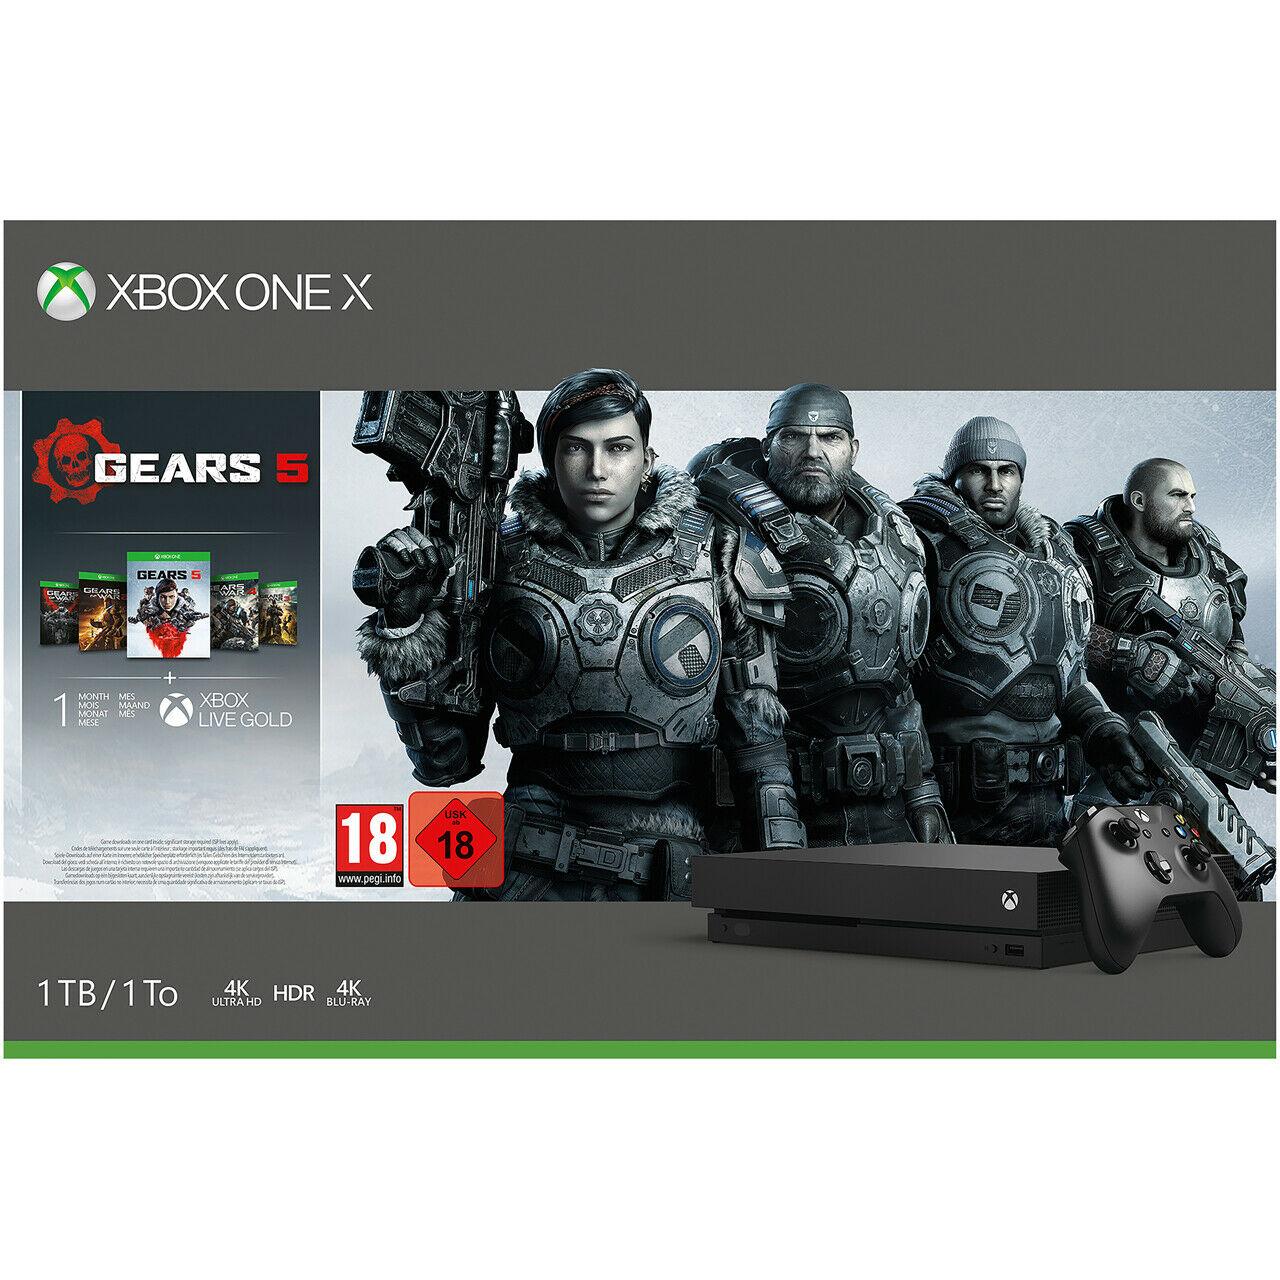 Microsoft Xbox One X - 1TB with Gears 1 - 5 Bundle - £275.49 @ Argos / eBay (Free Click & Collect)